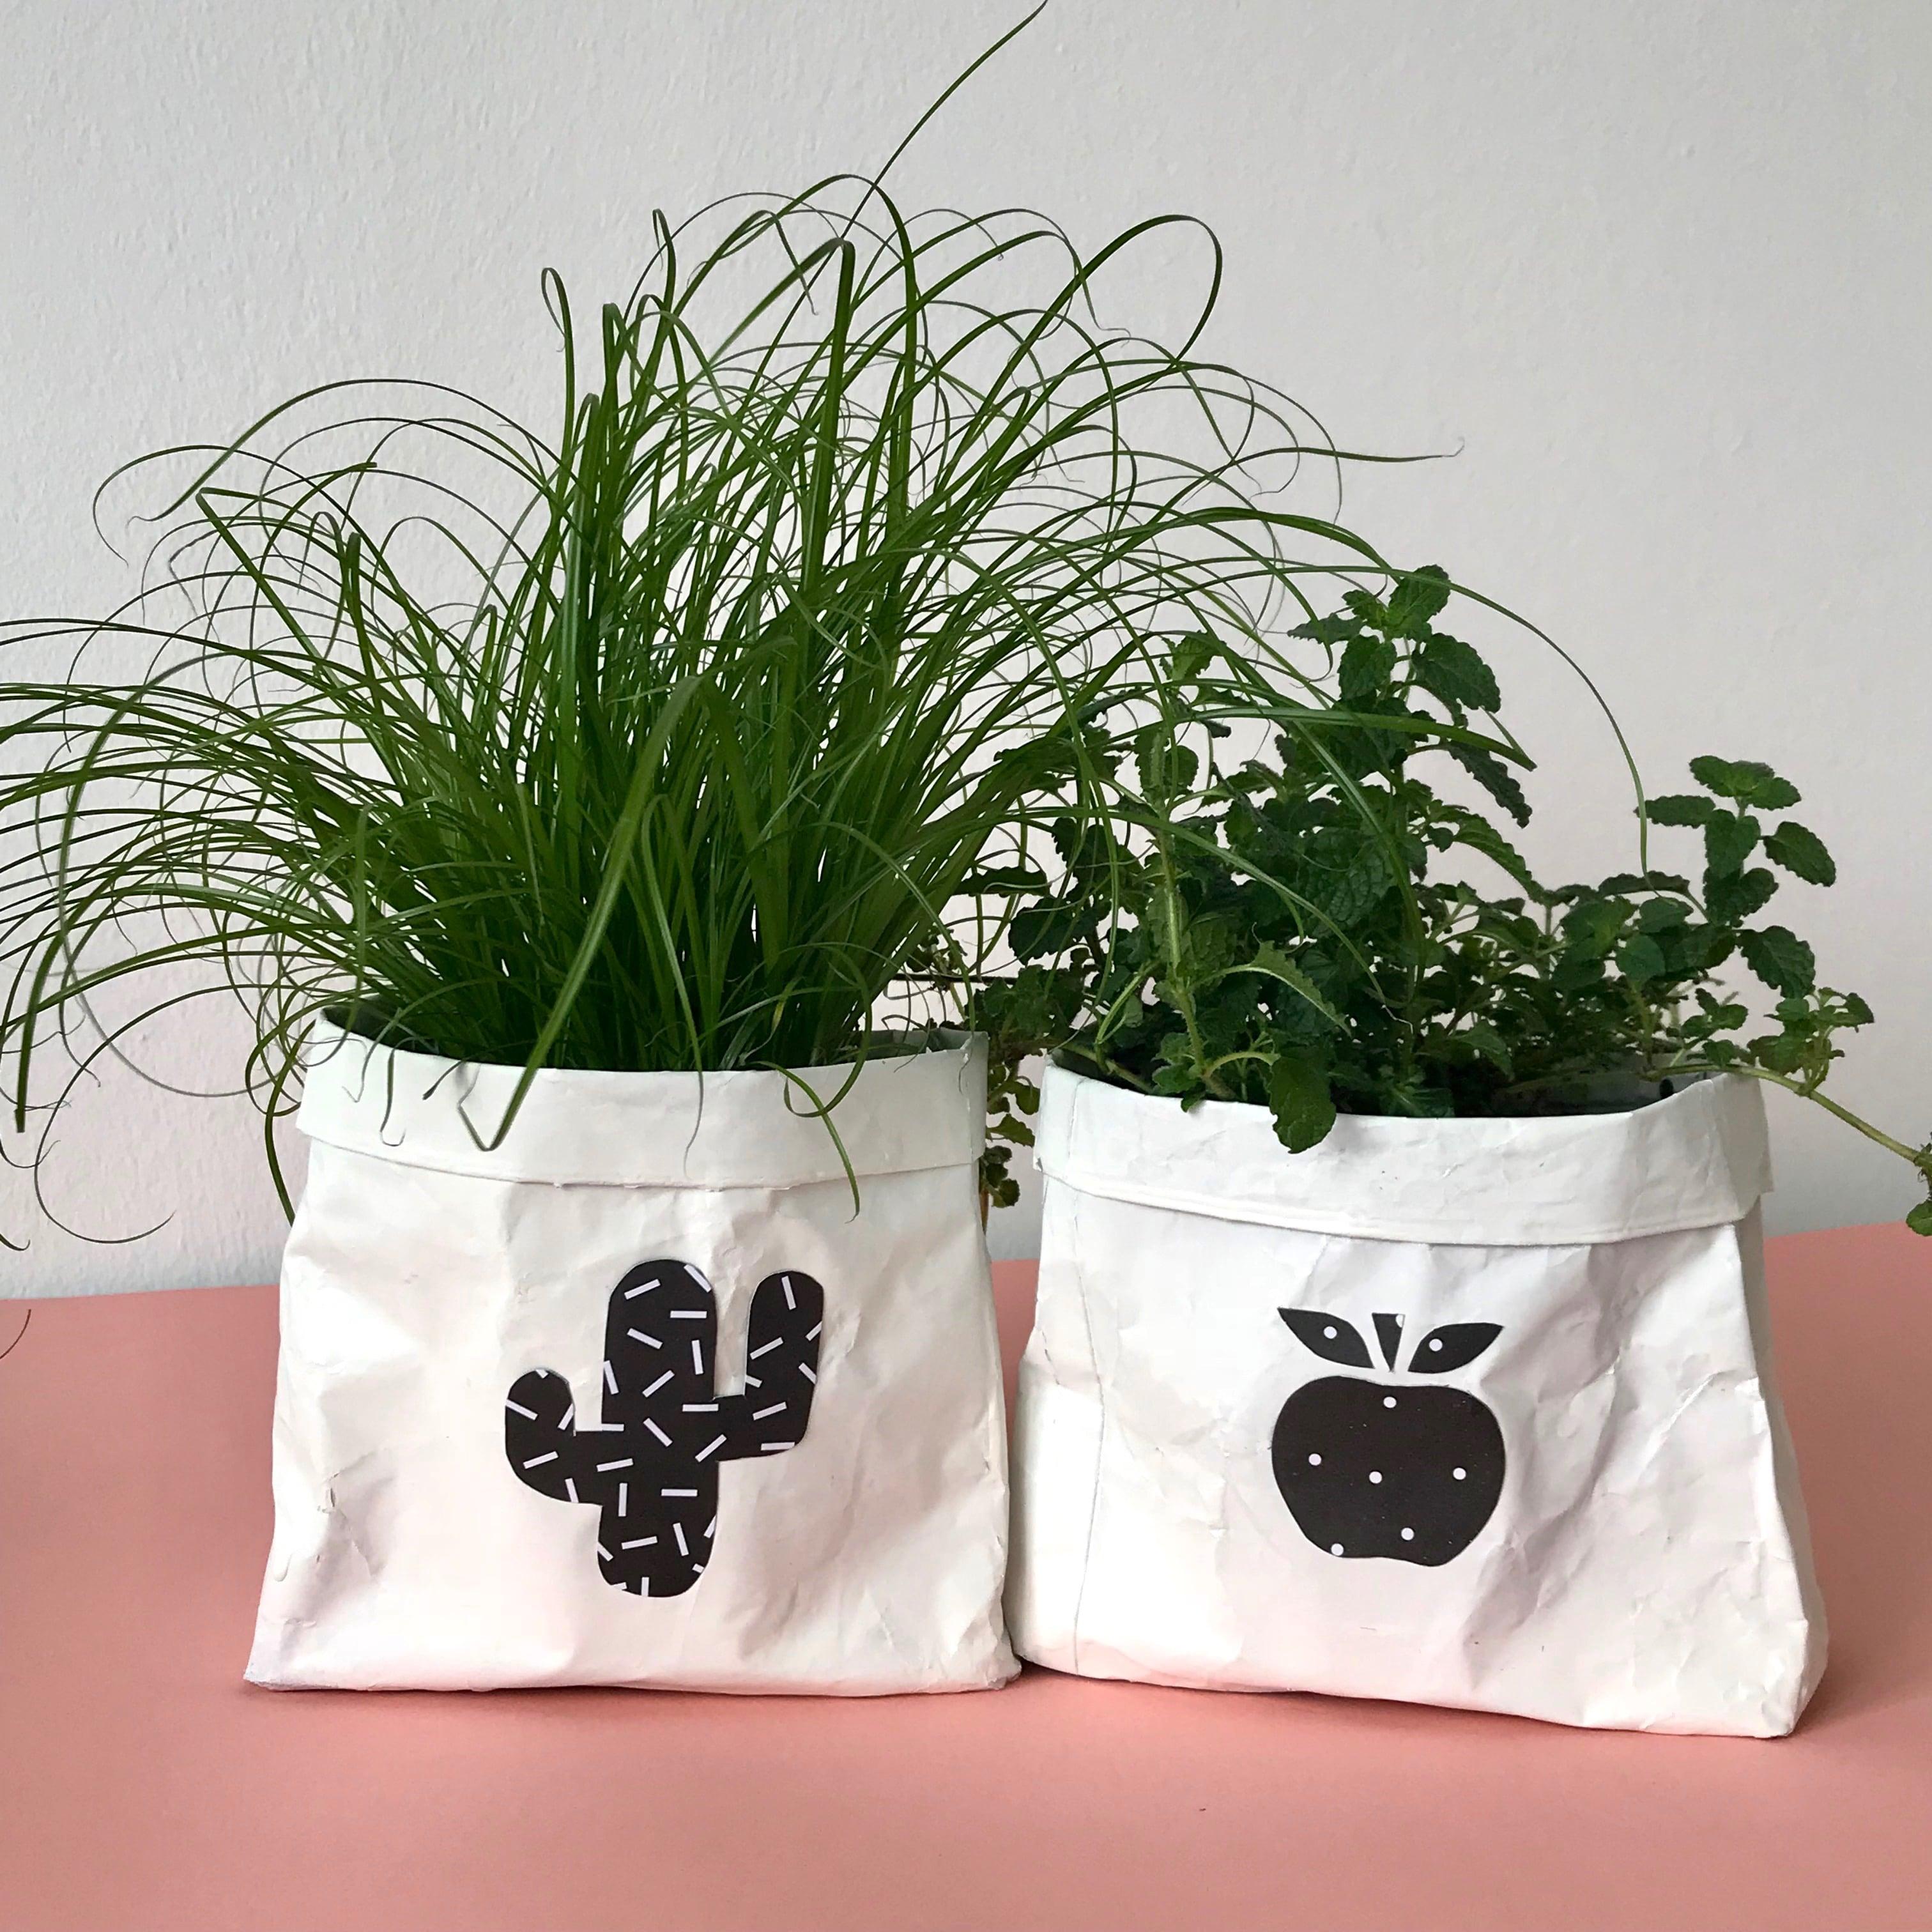 DIY Blumentopf to go, Upcyclingidee zum selber machen